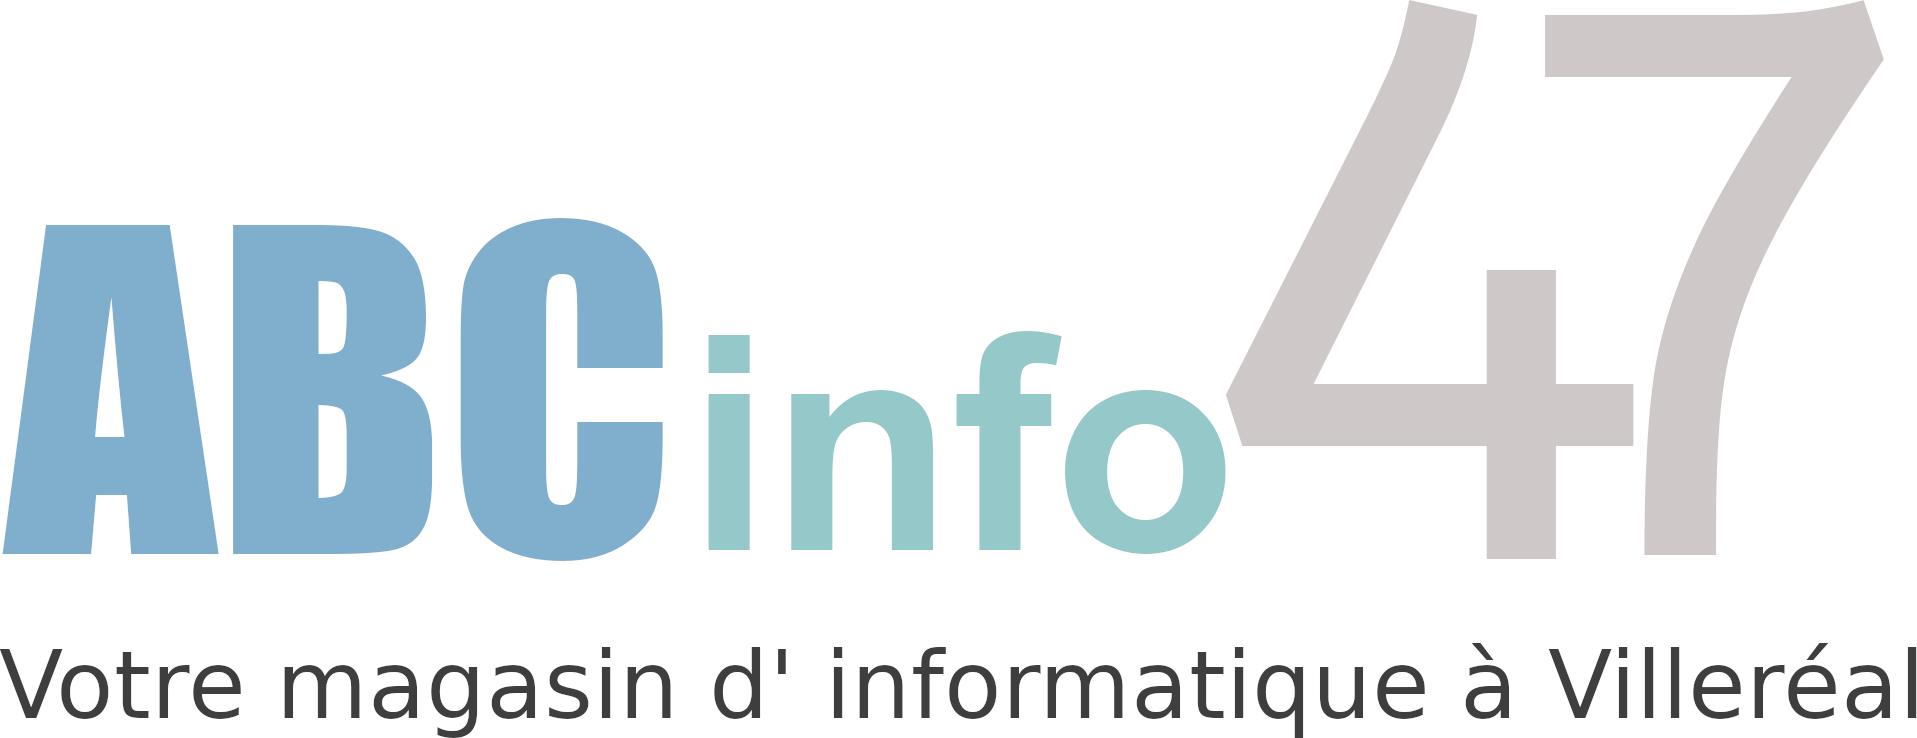 ABC-INFO47